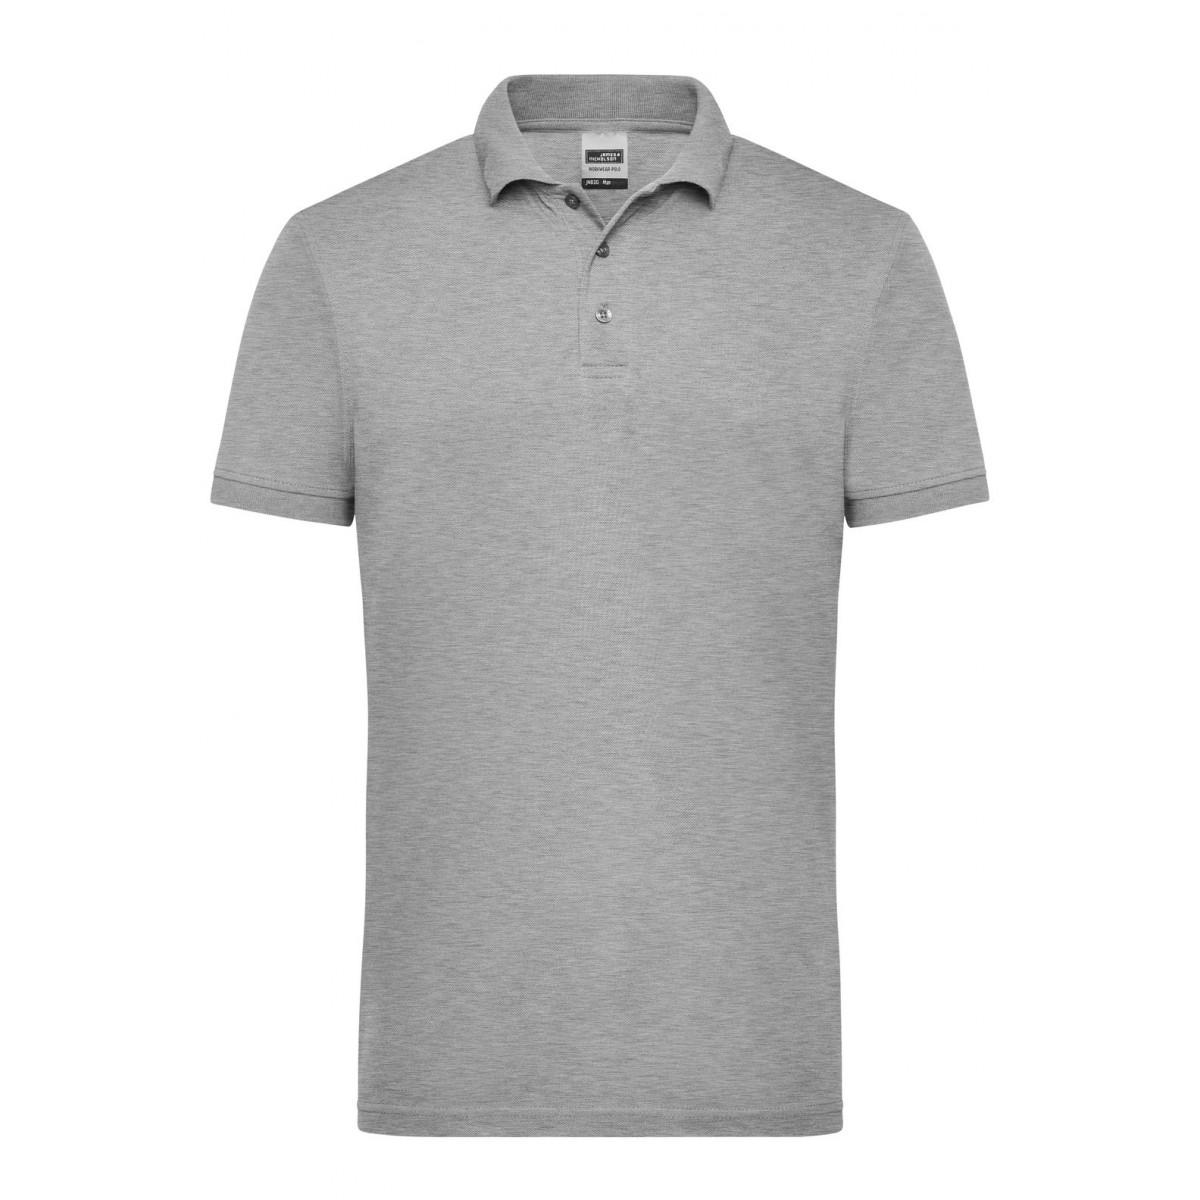 Рубашка поло мужская JN830 Mens Workwear Polo - Серый меланж